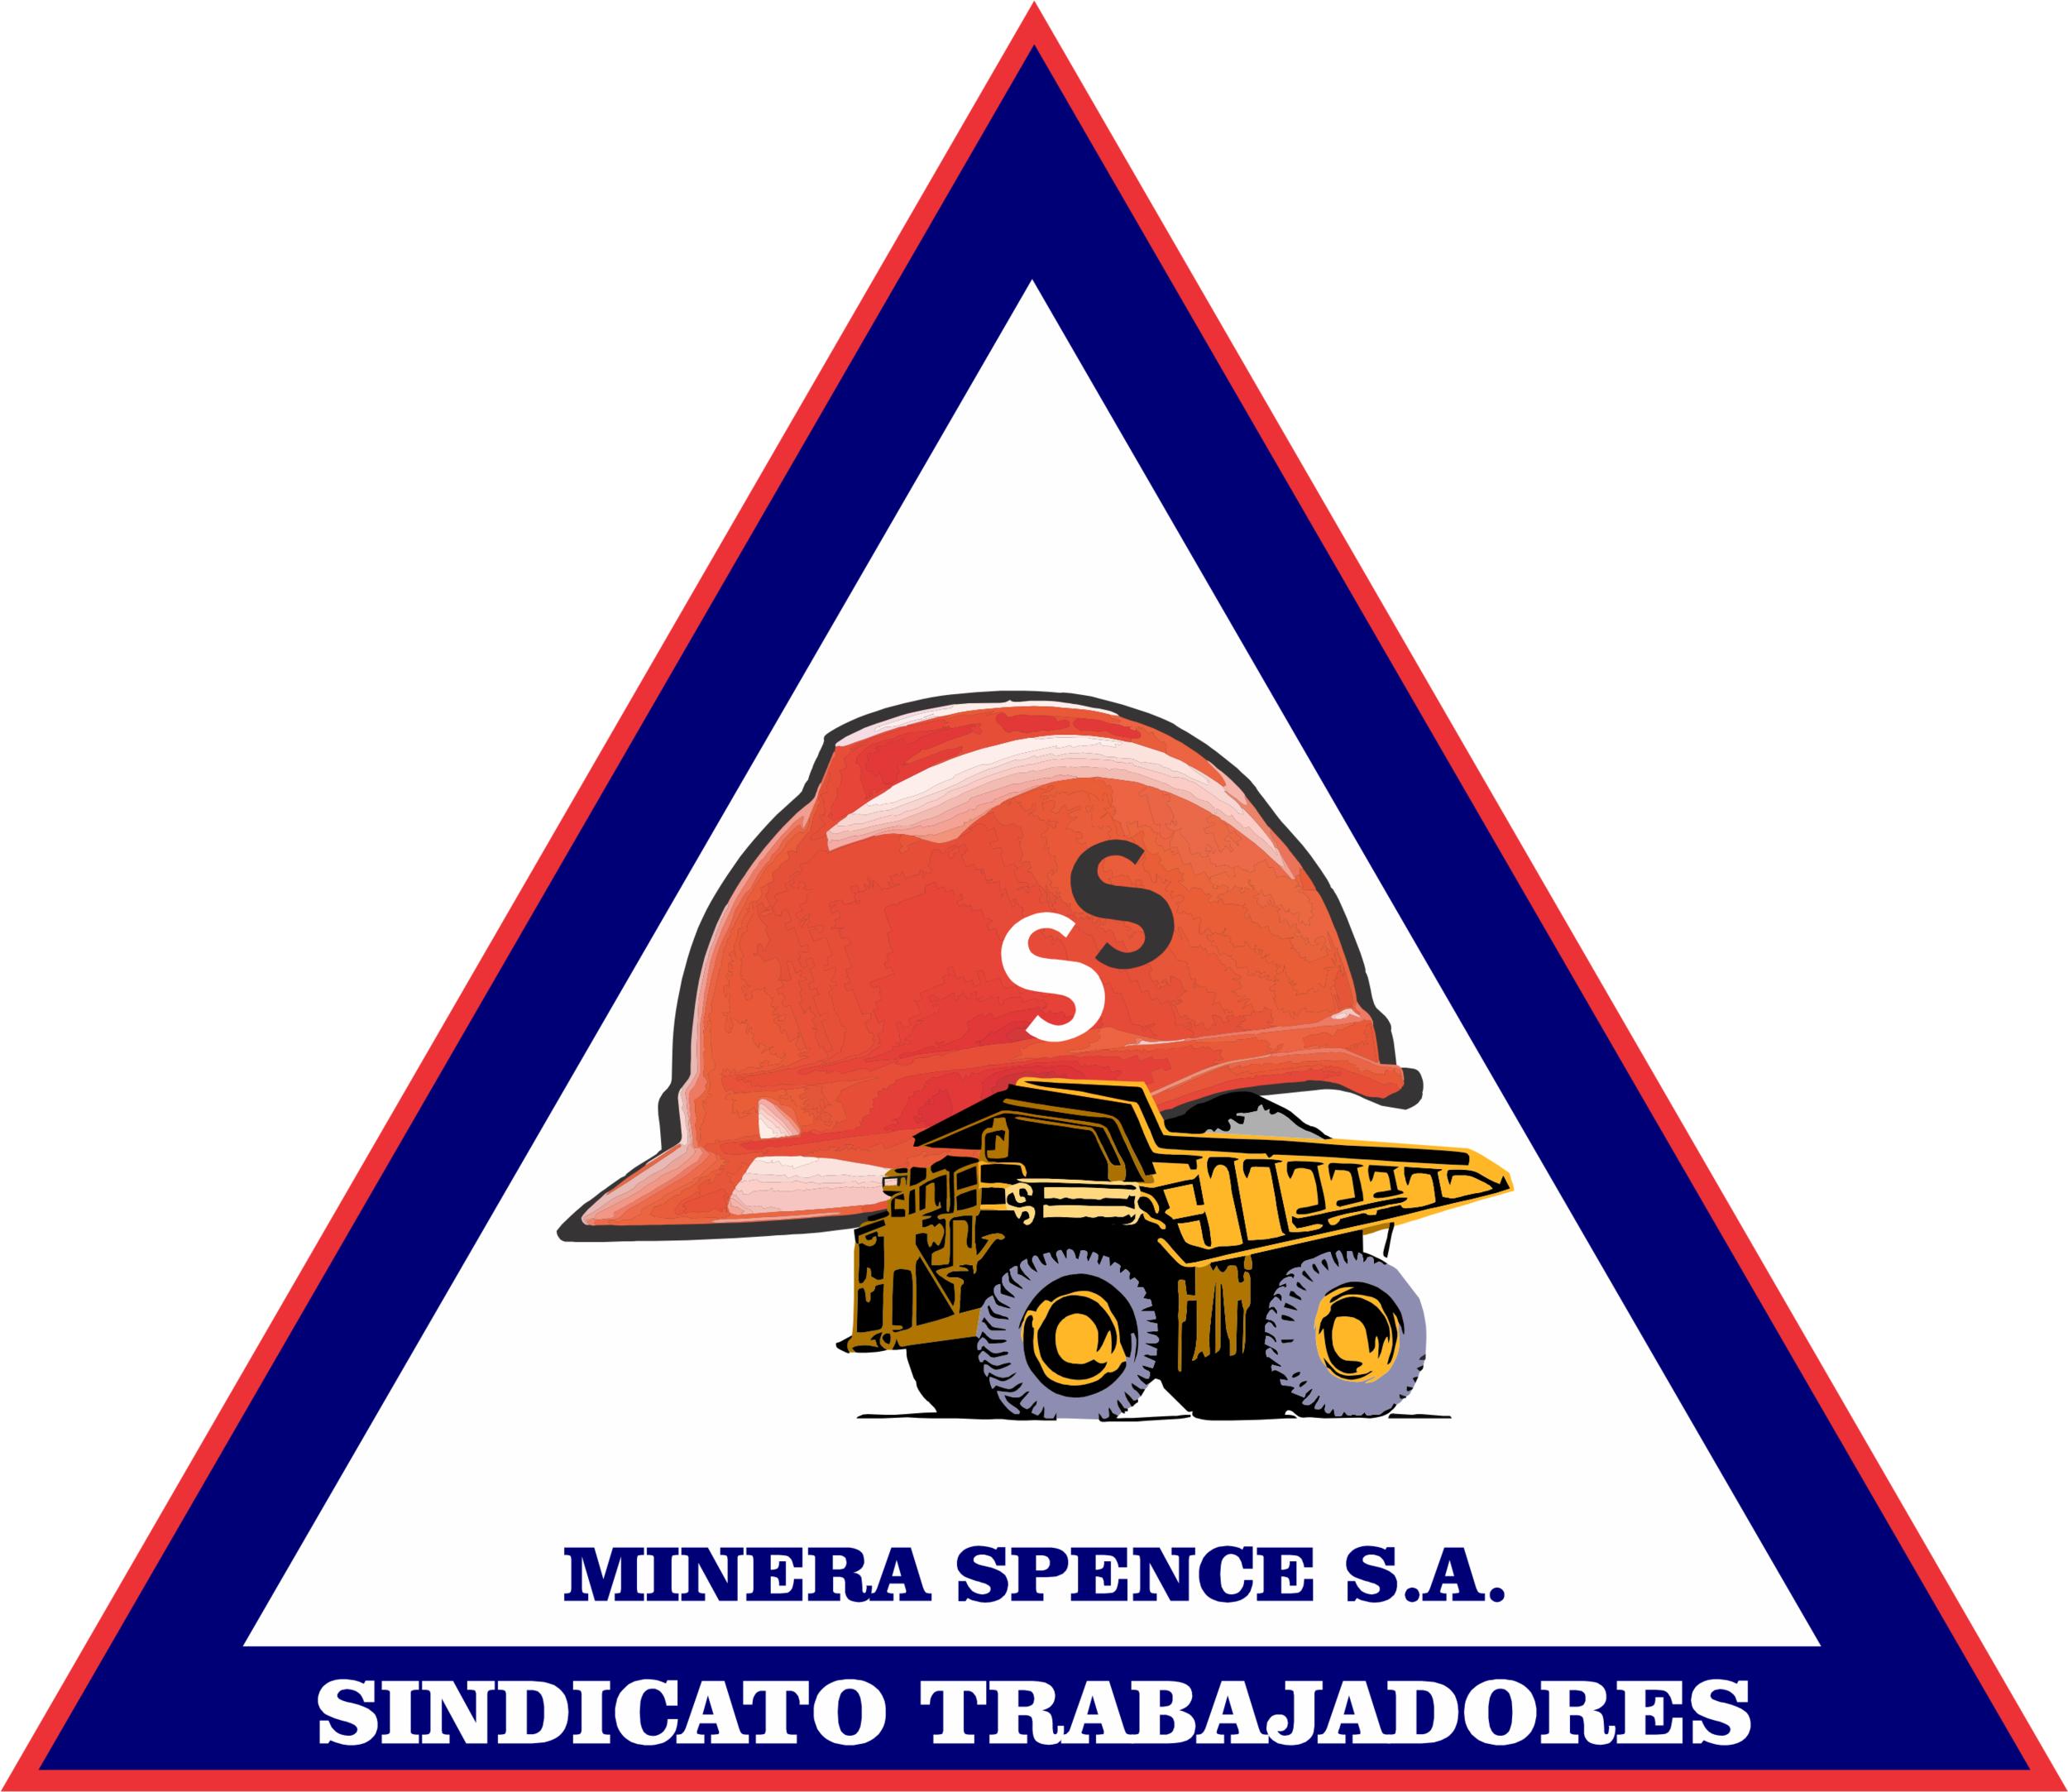 Sindicato Minera Spence - Colaborador